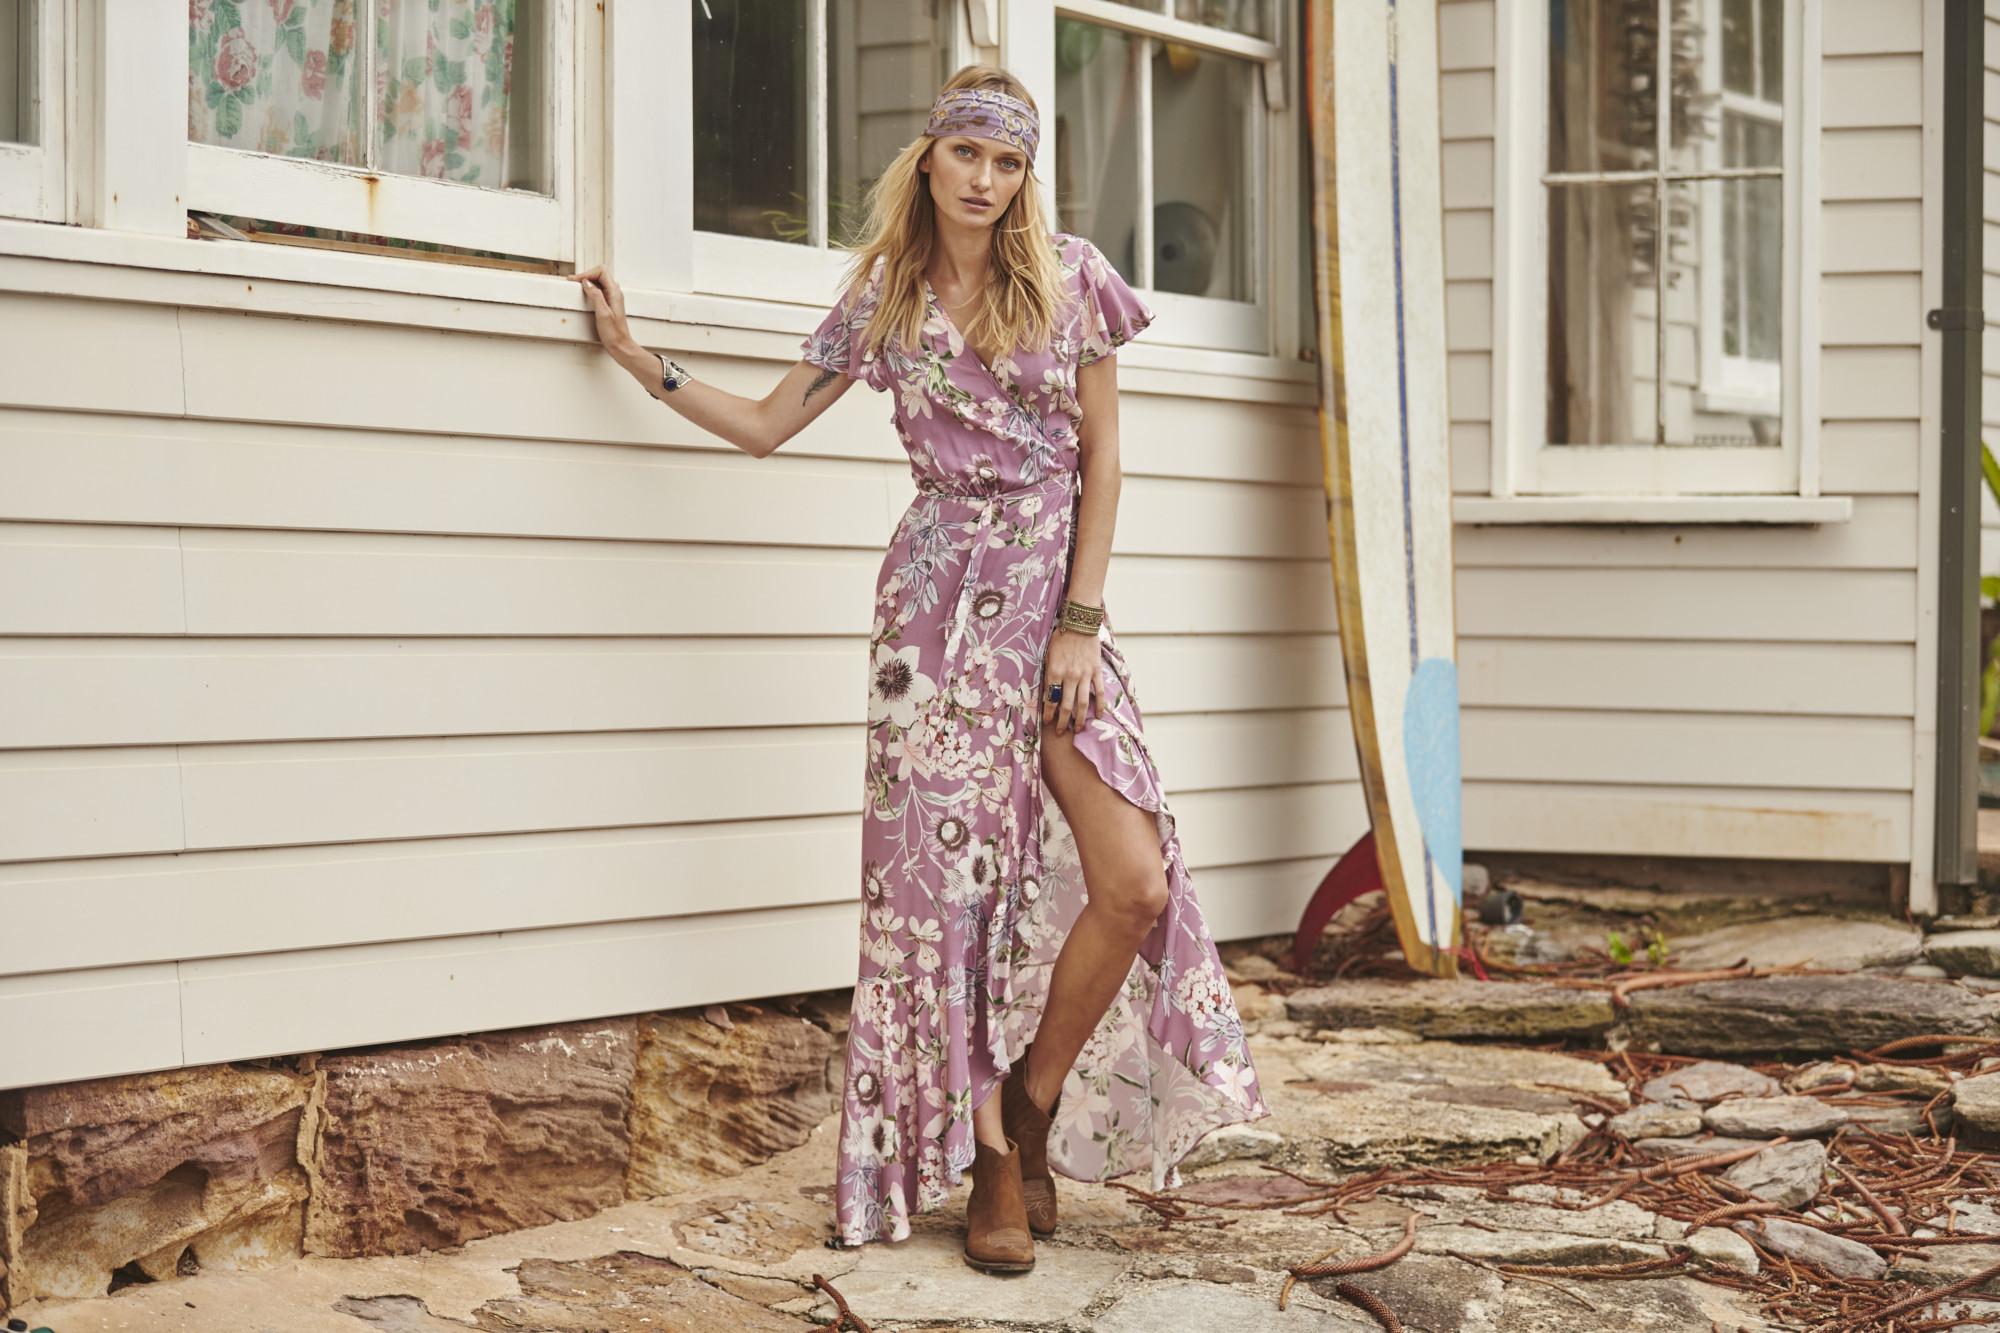 Augustina-Wrap-Dress-AUG-GDW2-16432-MFP-moon-flower-plum_3